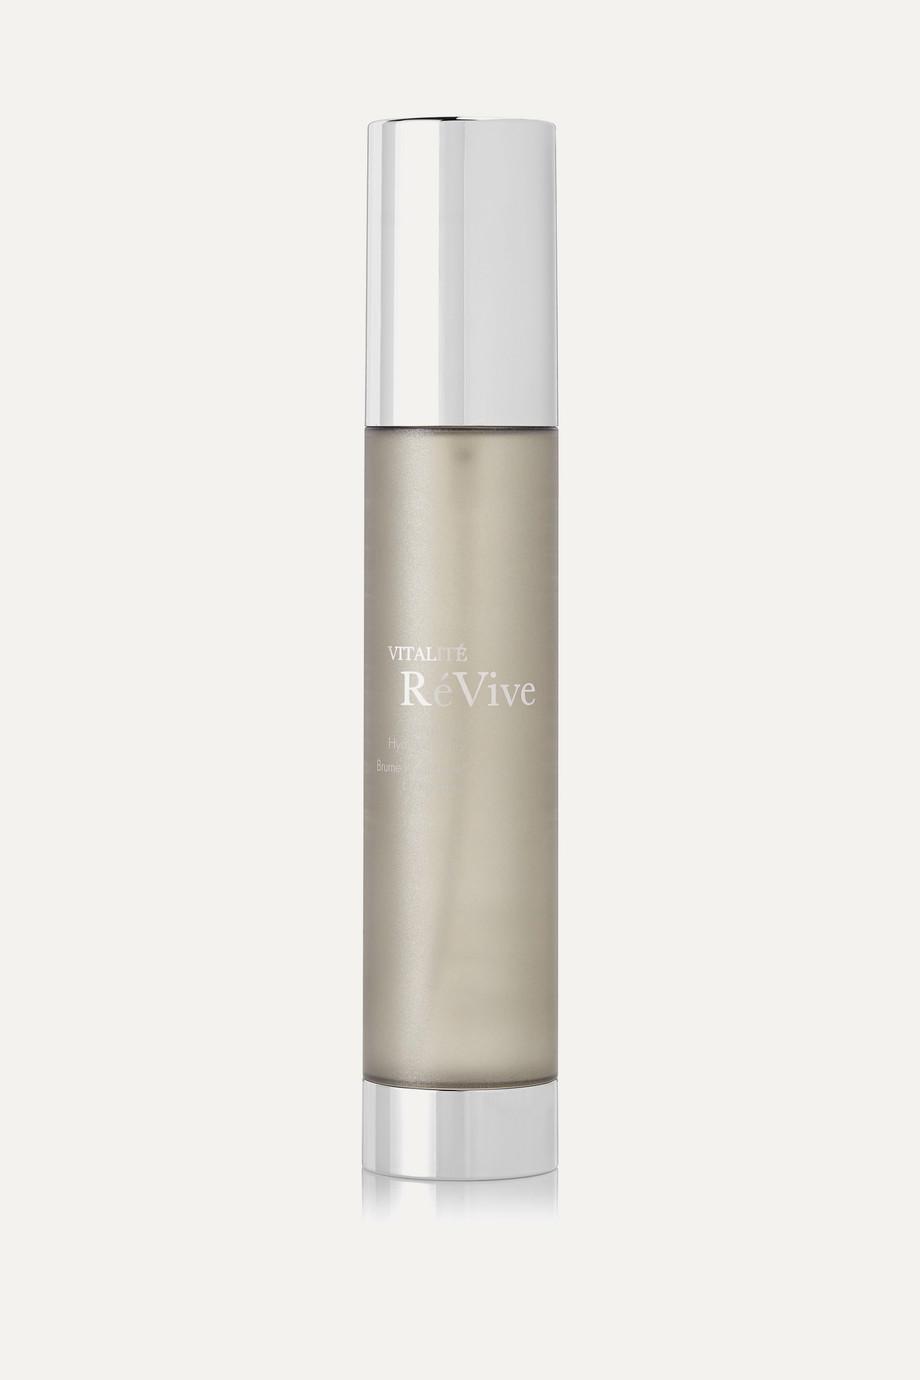 RéVive Vitalité Energizing Hydration Mist, 93.4 ml